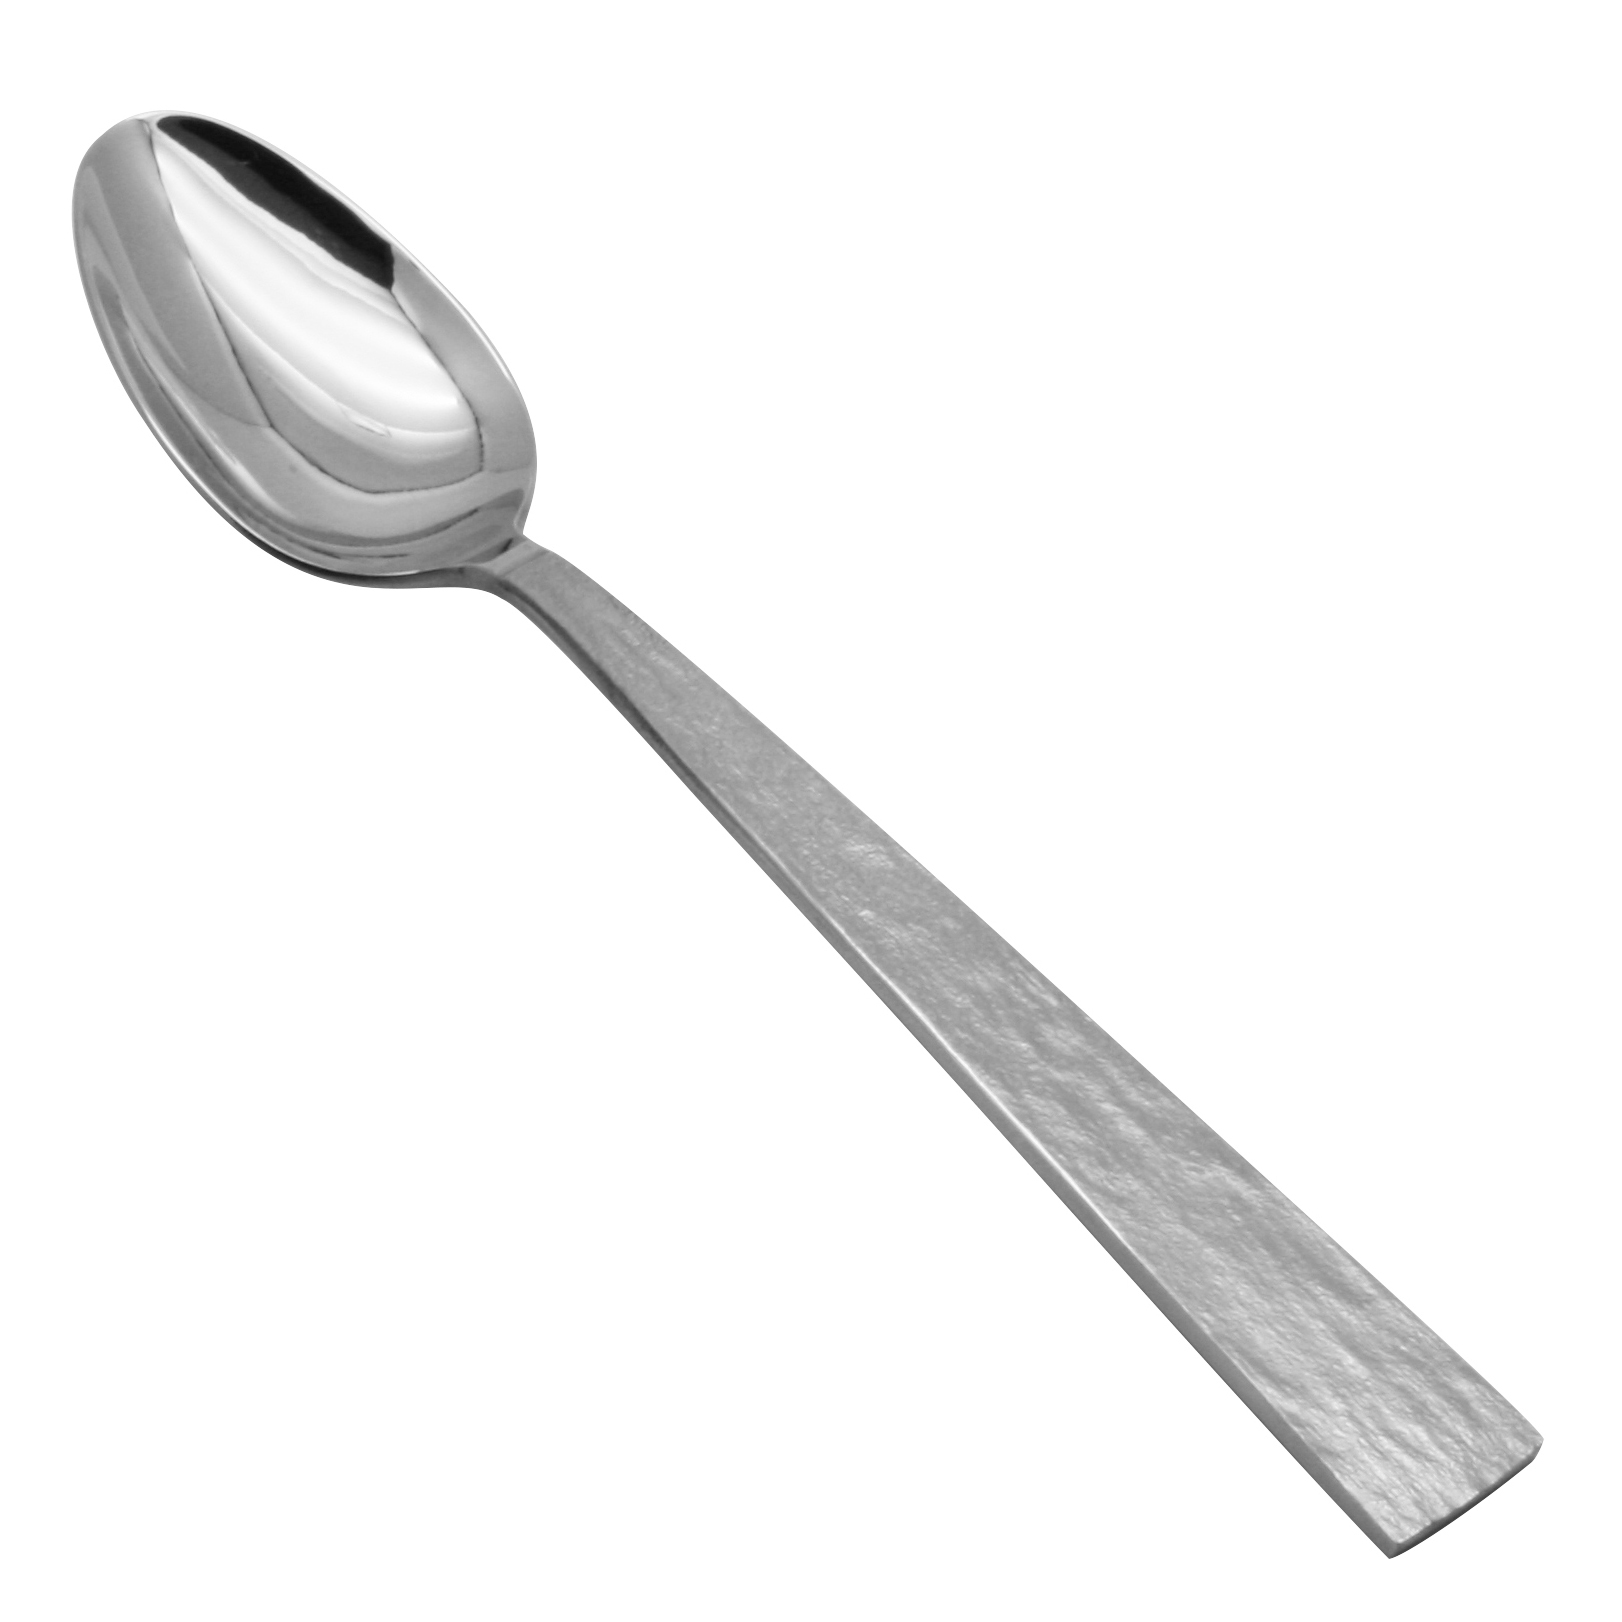 Winco Z-CR-03 spoon, dinner